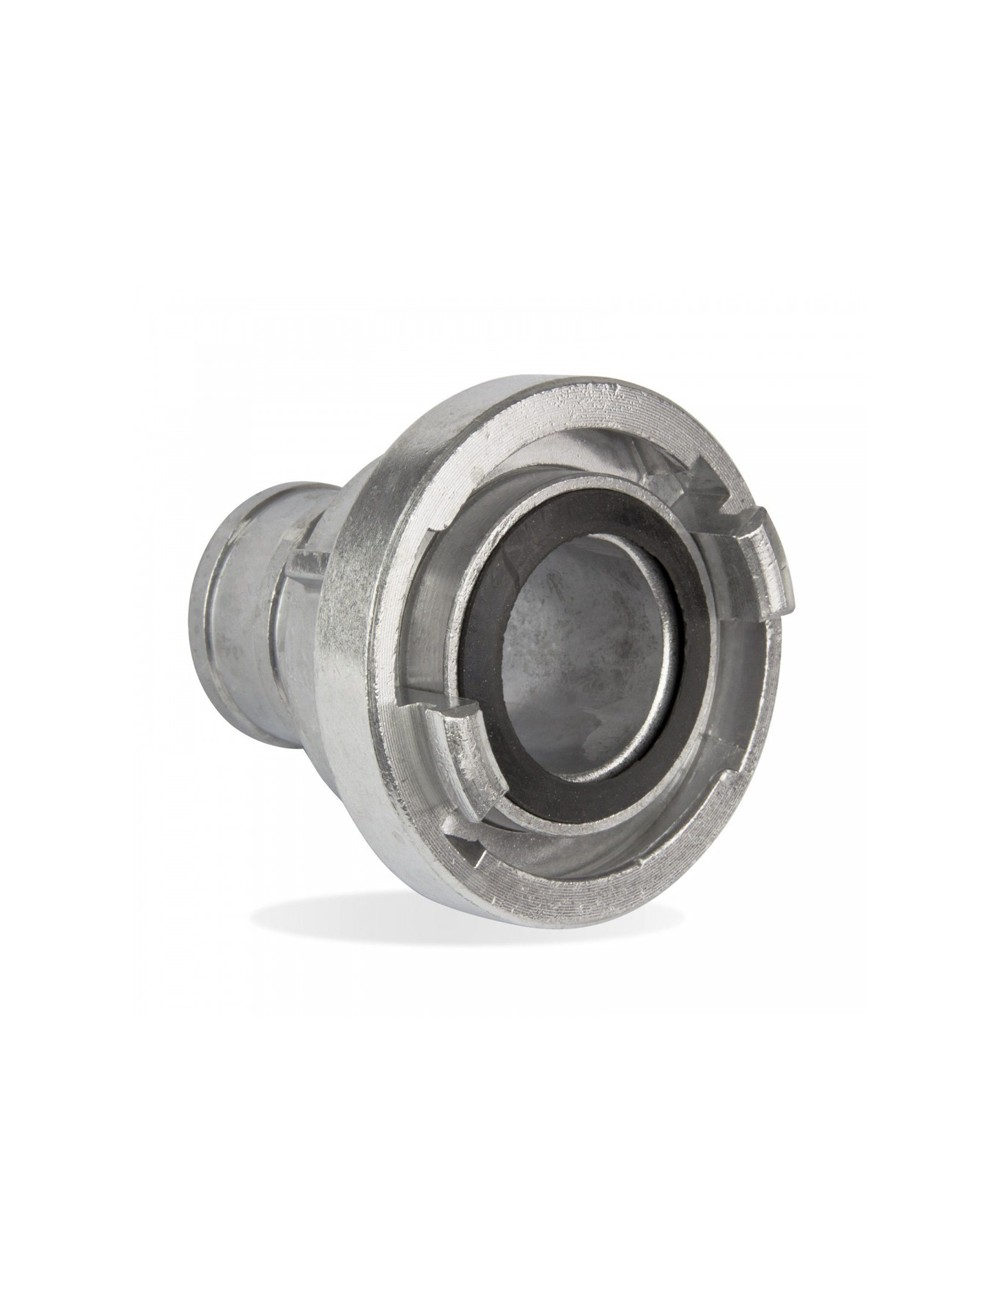 "Cupla mobila cu portfurtun (racord furtun pompieri refulare STORZ) - tip A, 4"" - 110mm"